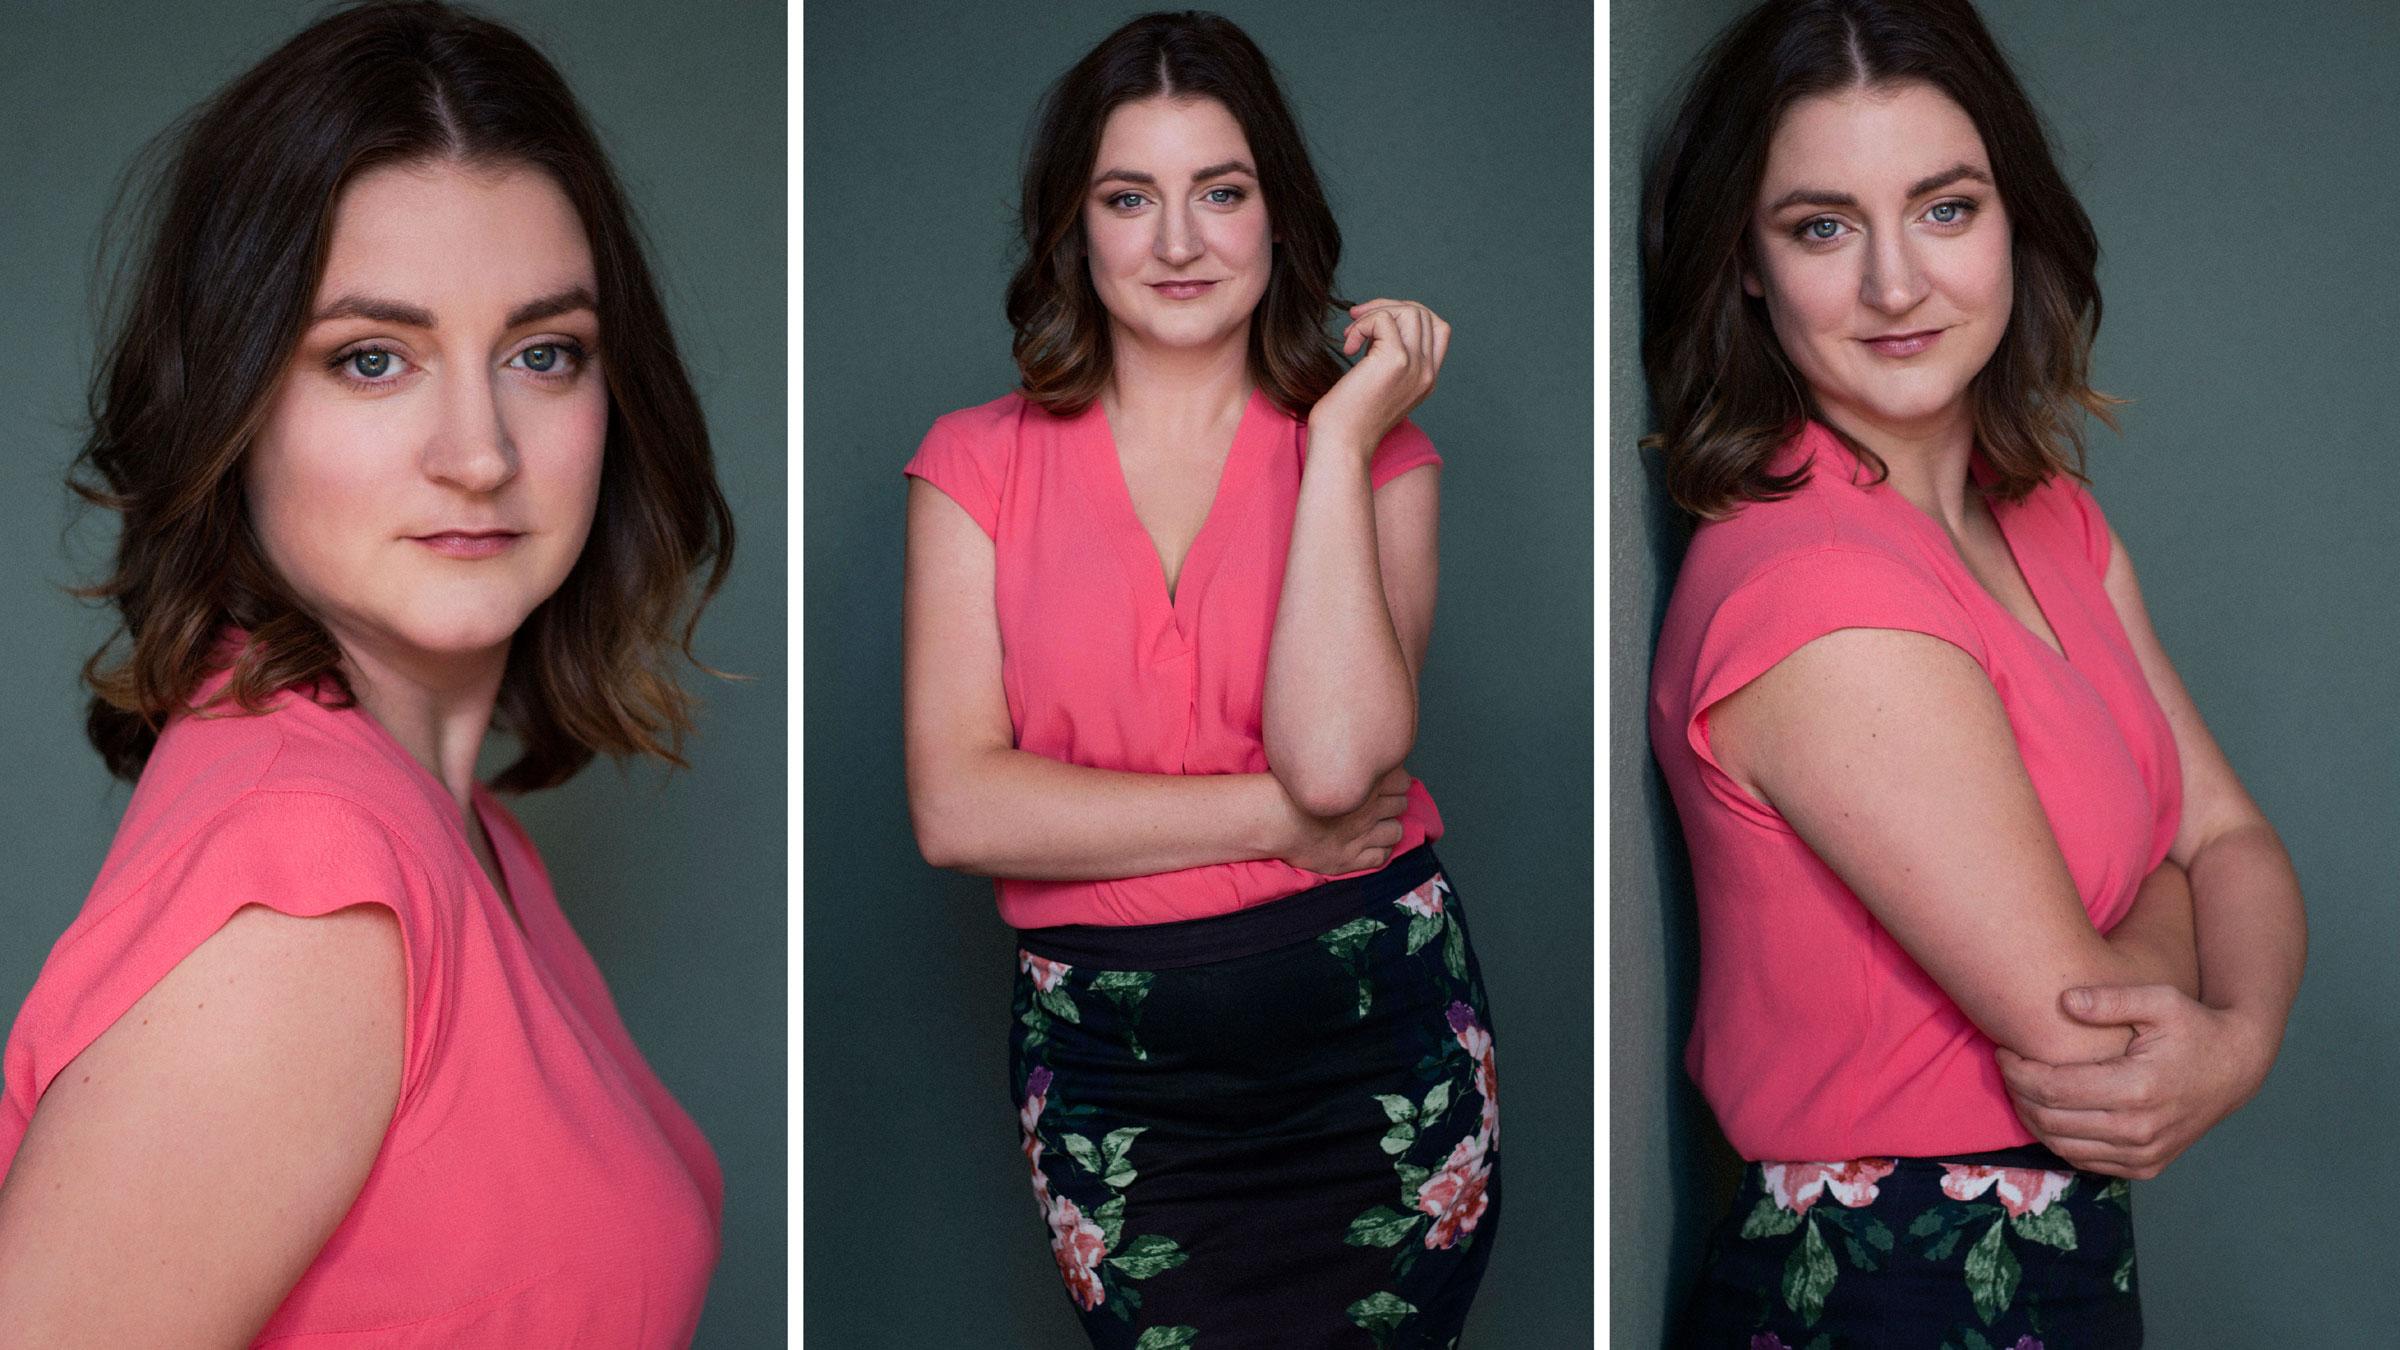 Charlotte-kensington-portraits-headshots-8.jpg